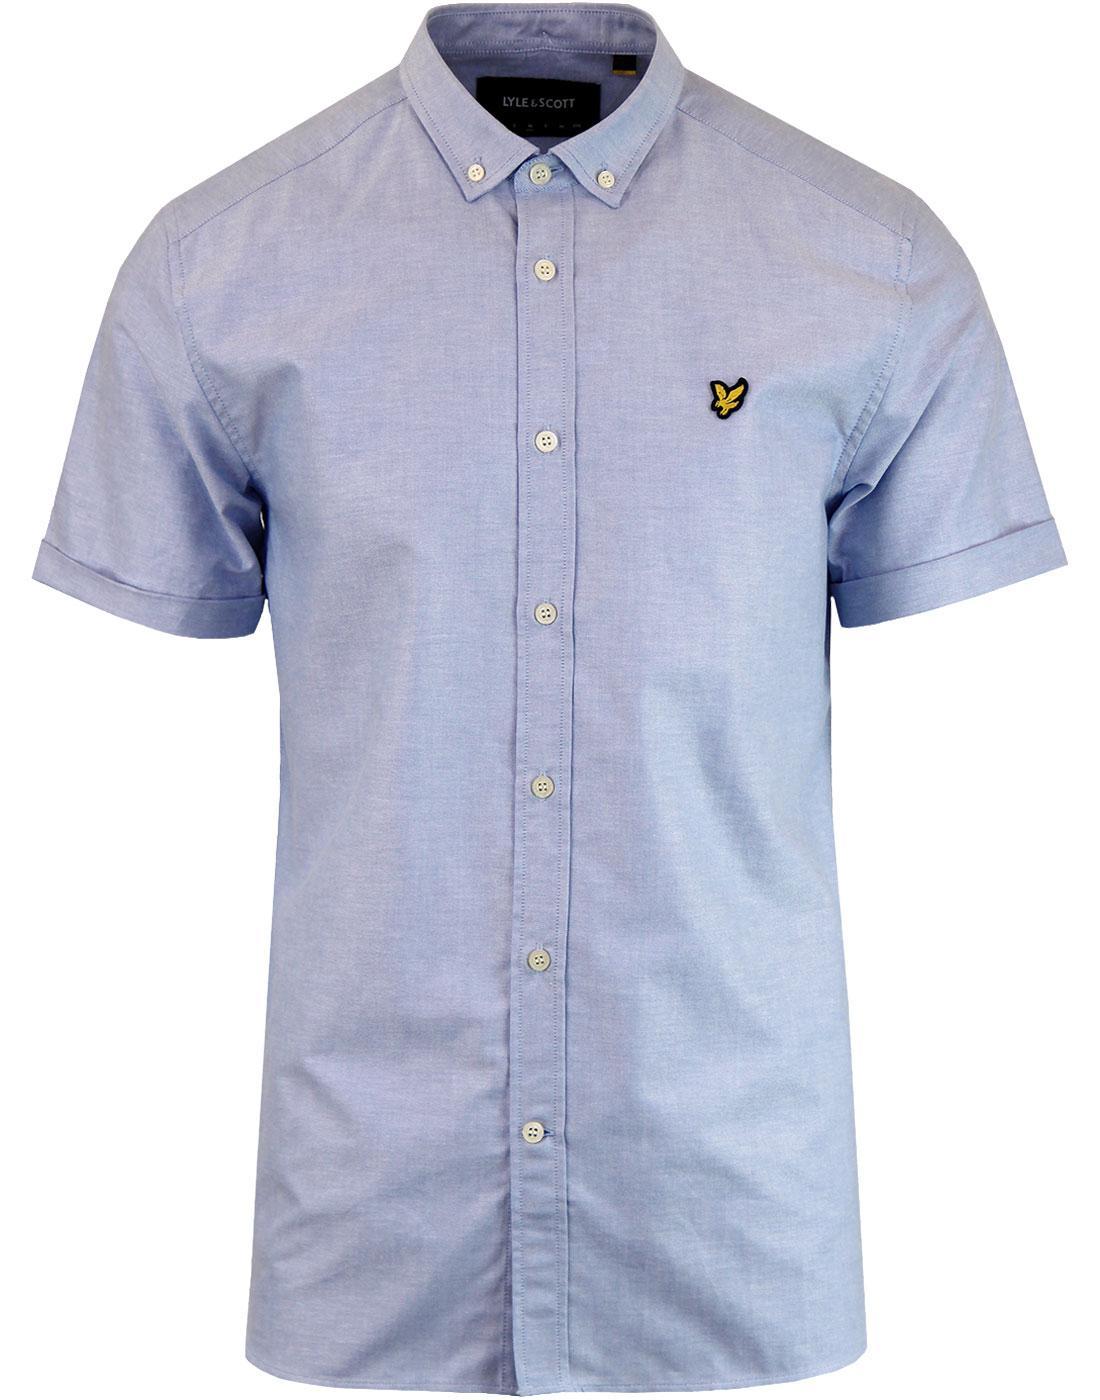 LYLE & SCOTT Button Down SS Oxford Shirt RIVIERA